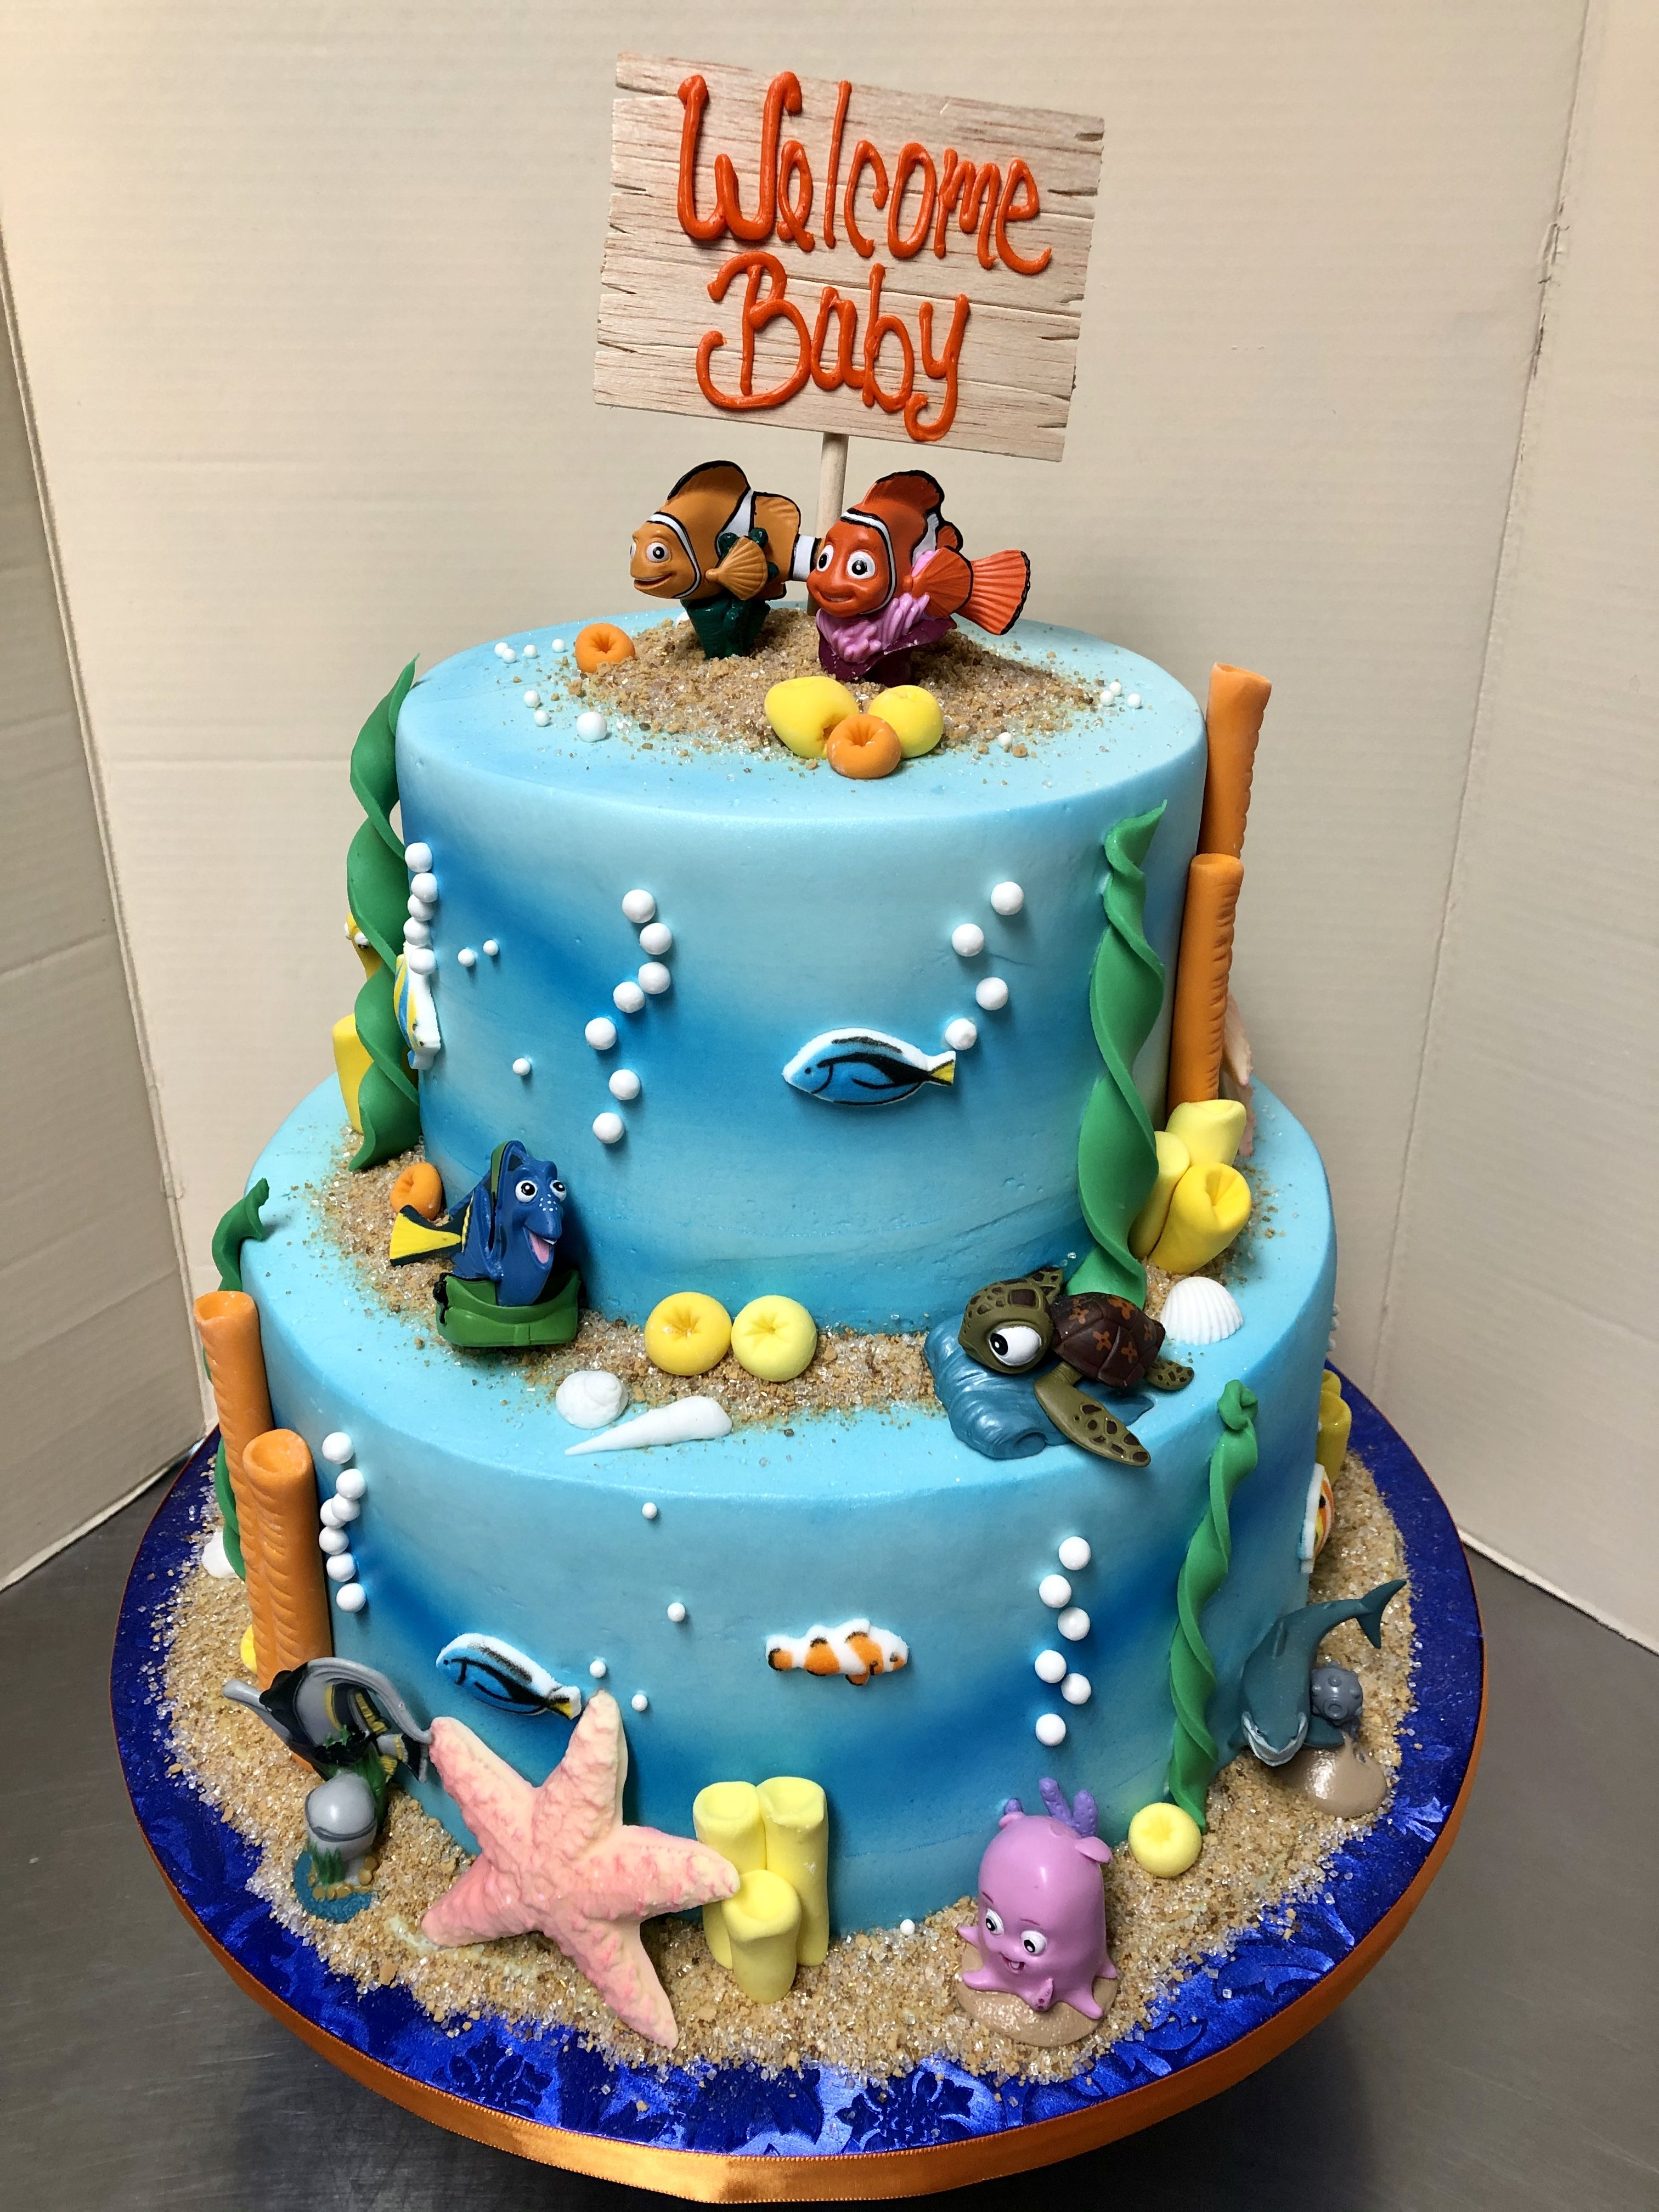 Finding Nemo Baby Shower Cake In 2020 Cake Baby Shower Cakes Shower Cakes